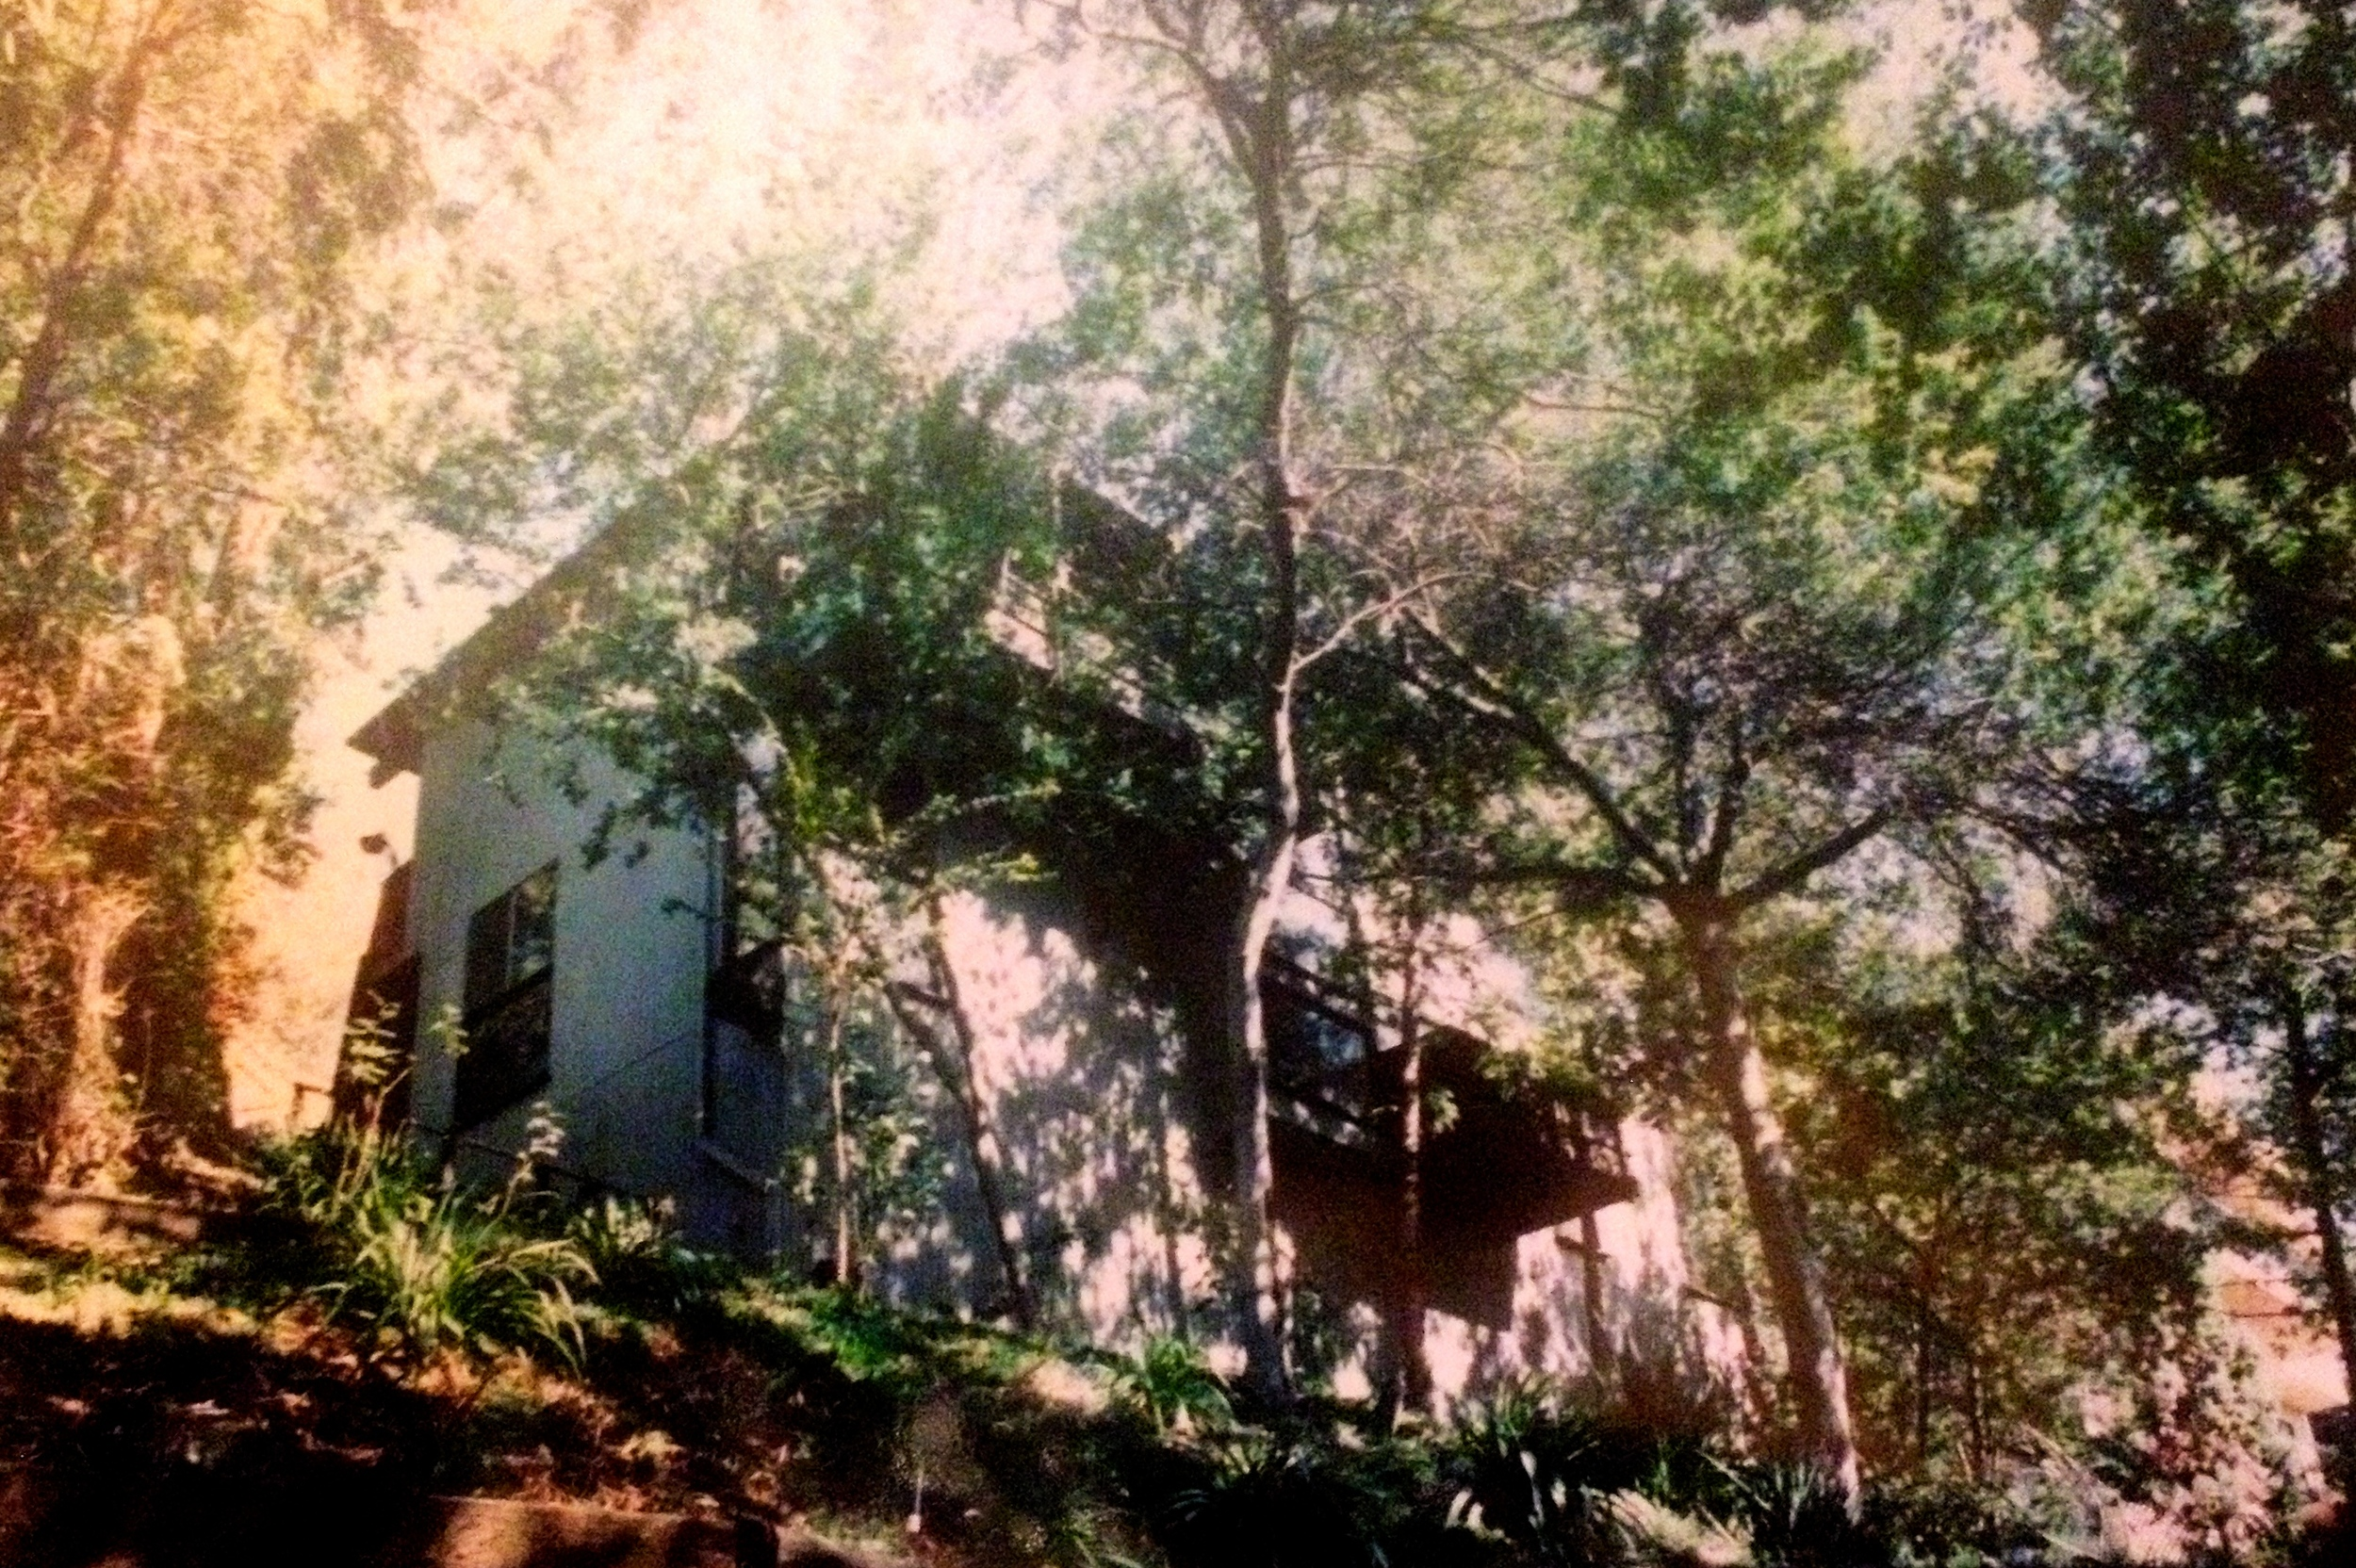 My Childhood Home (Age 2-18)